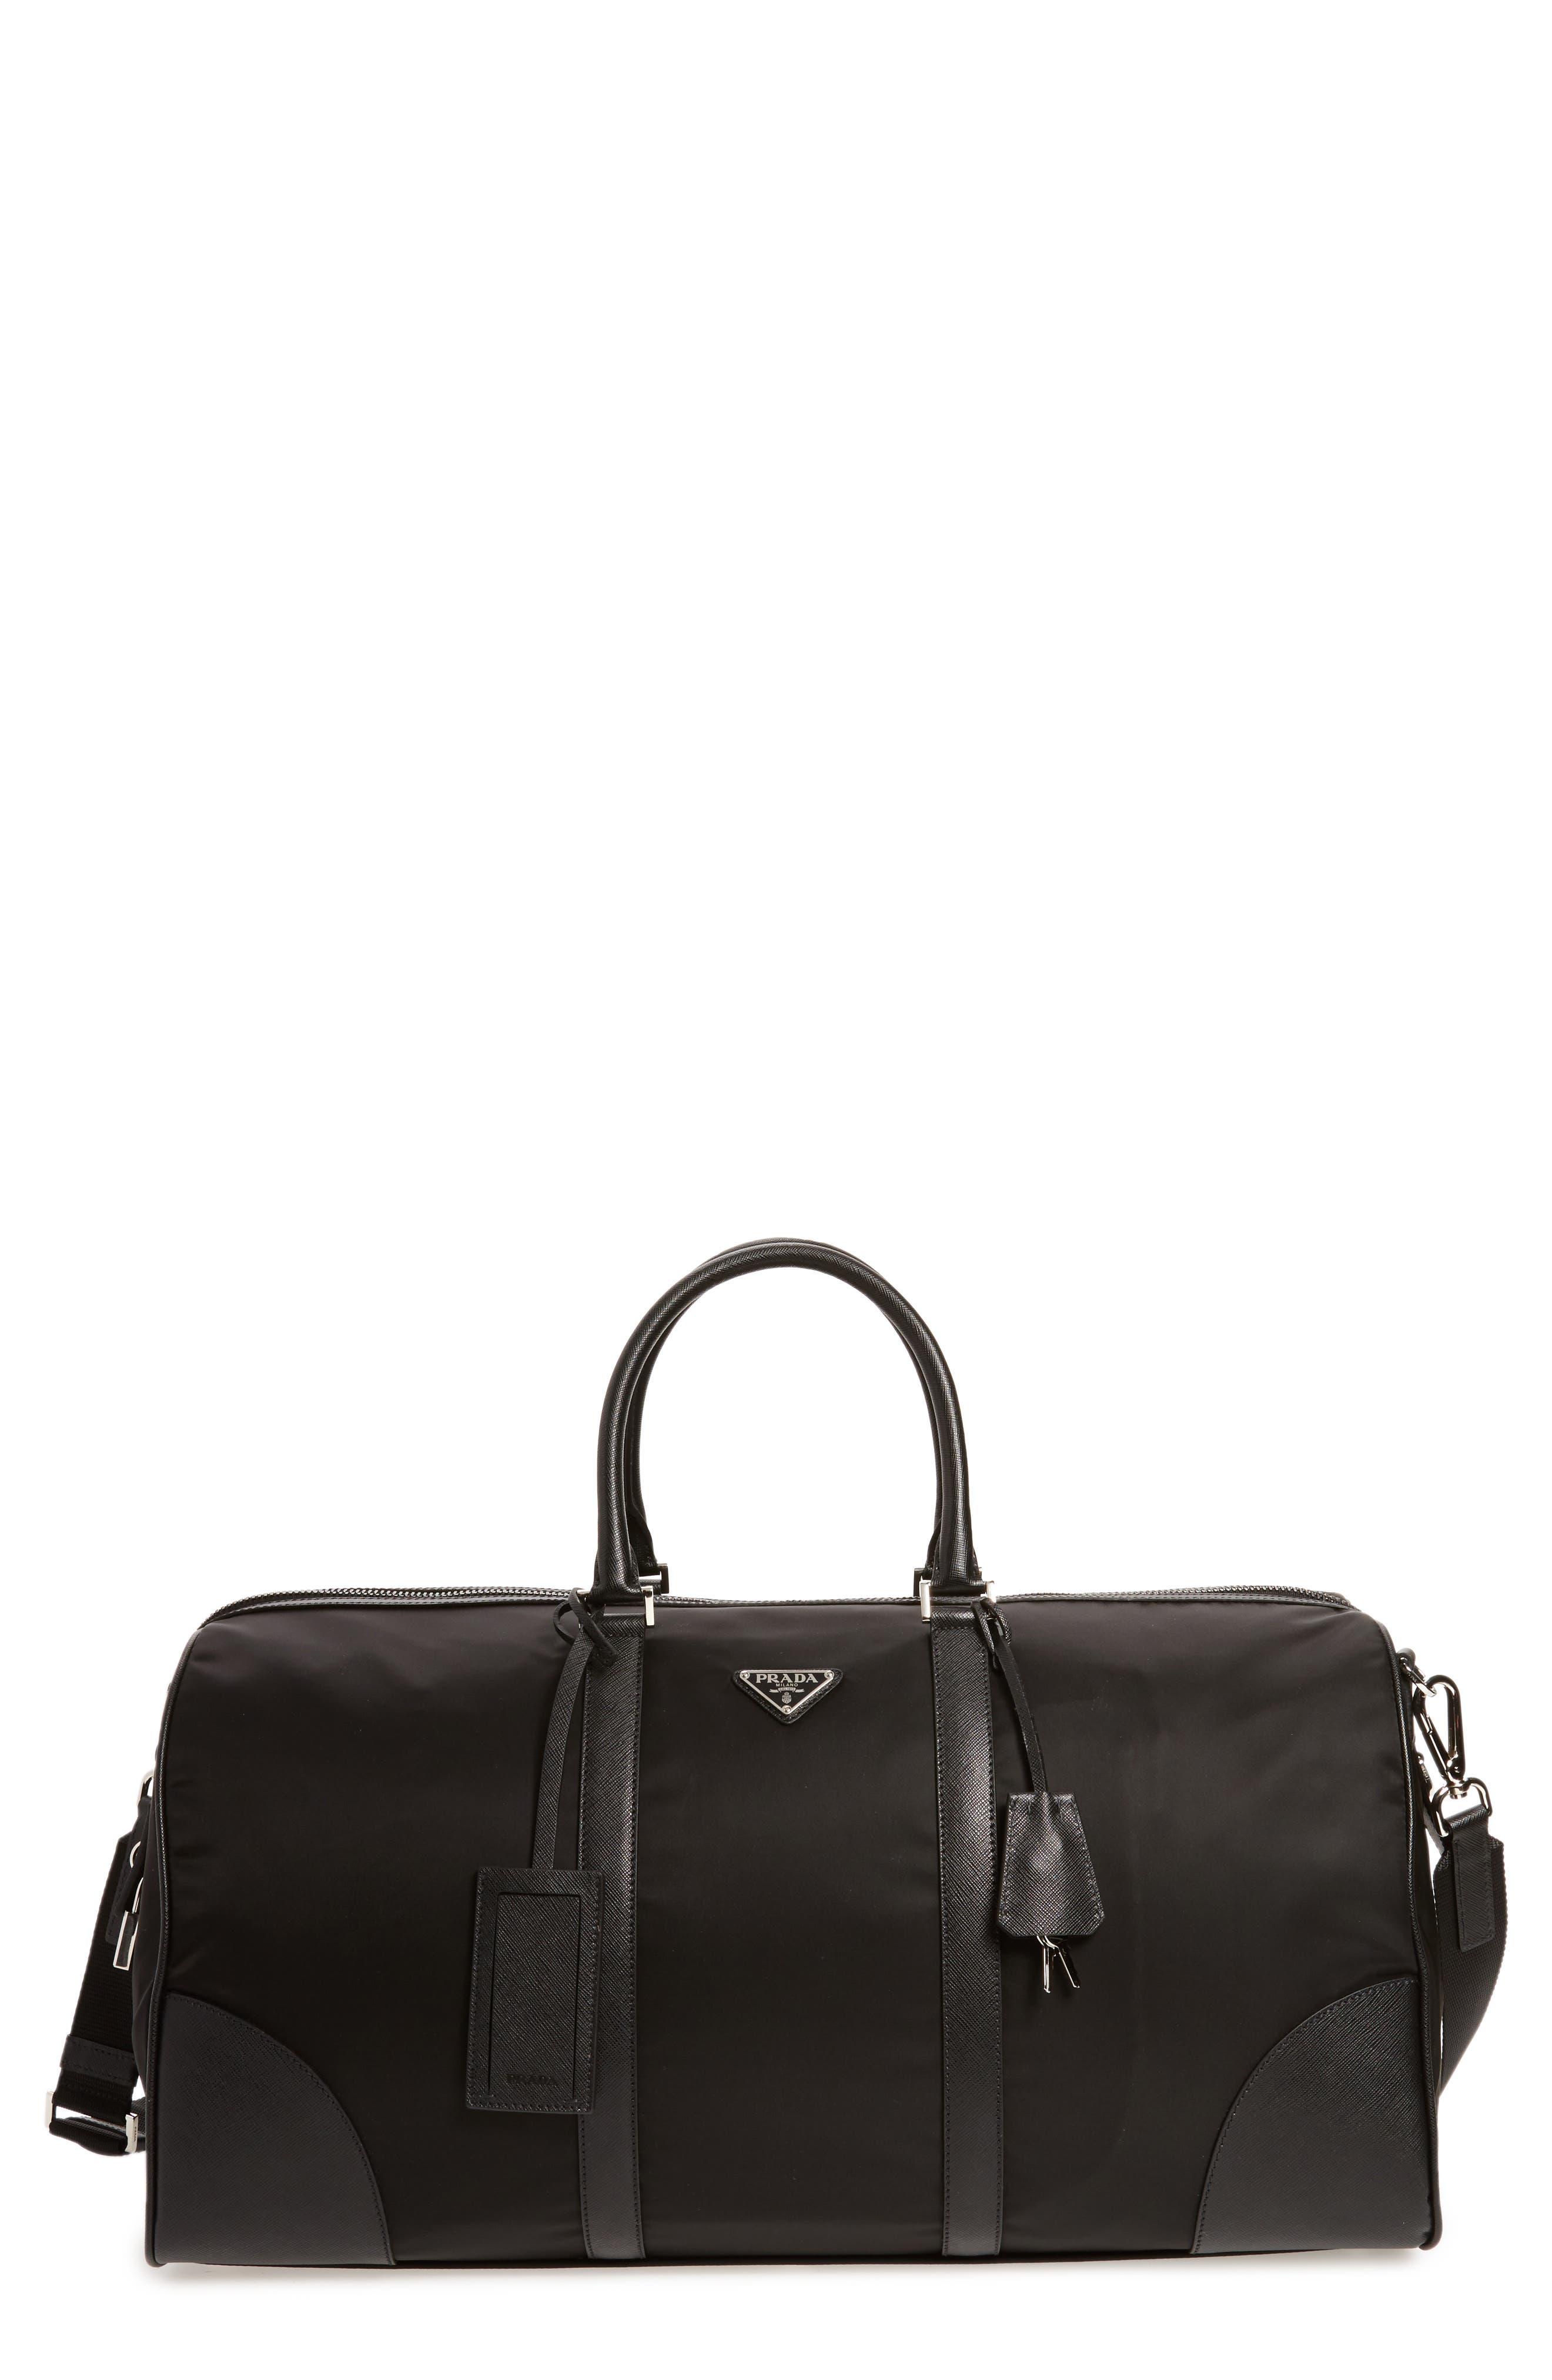 Prada Nylon & Saffiano Leather Bowling Bag